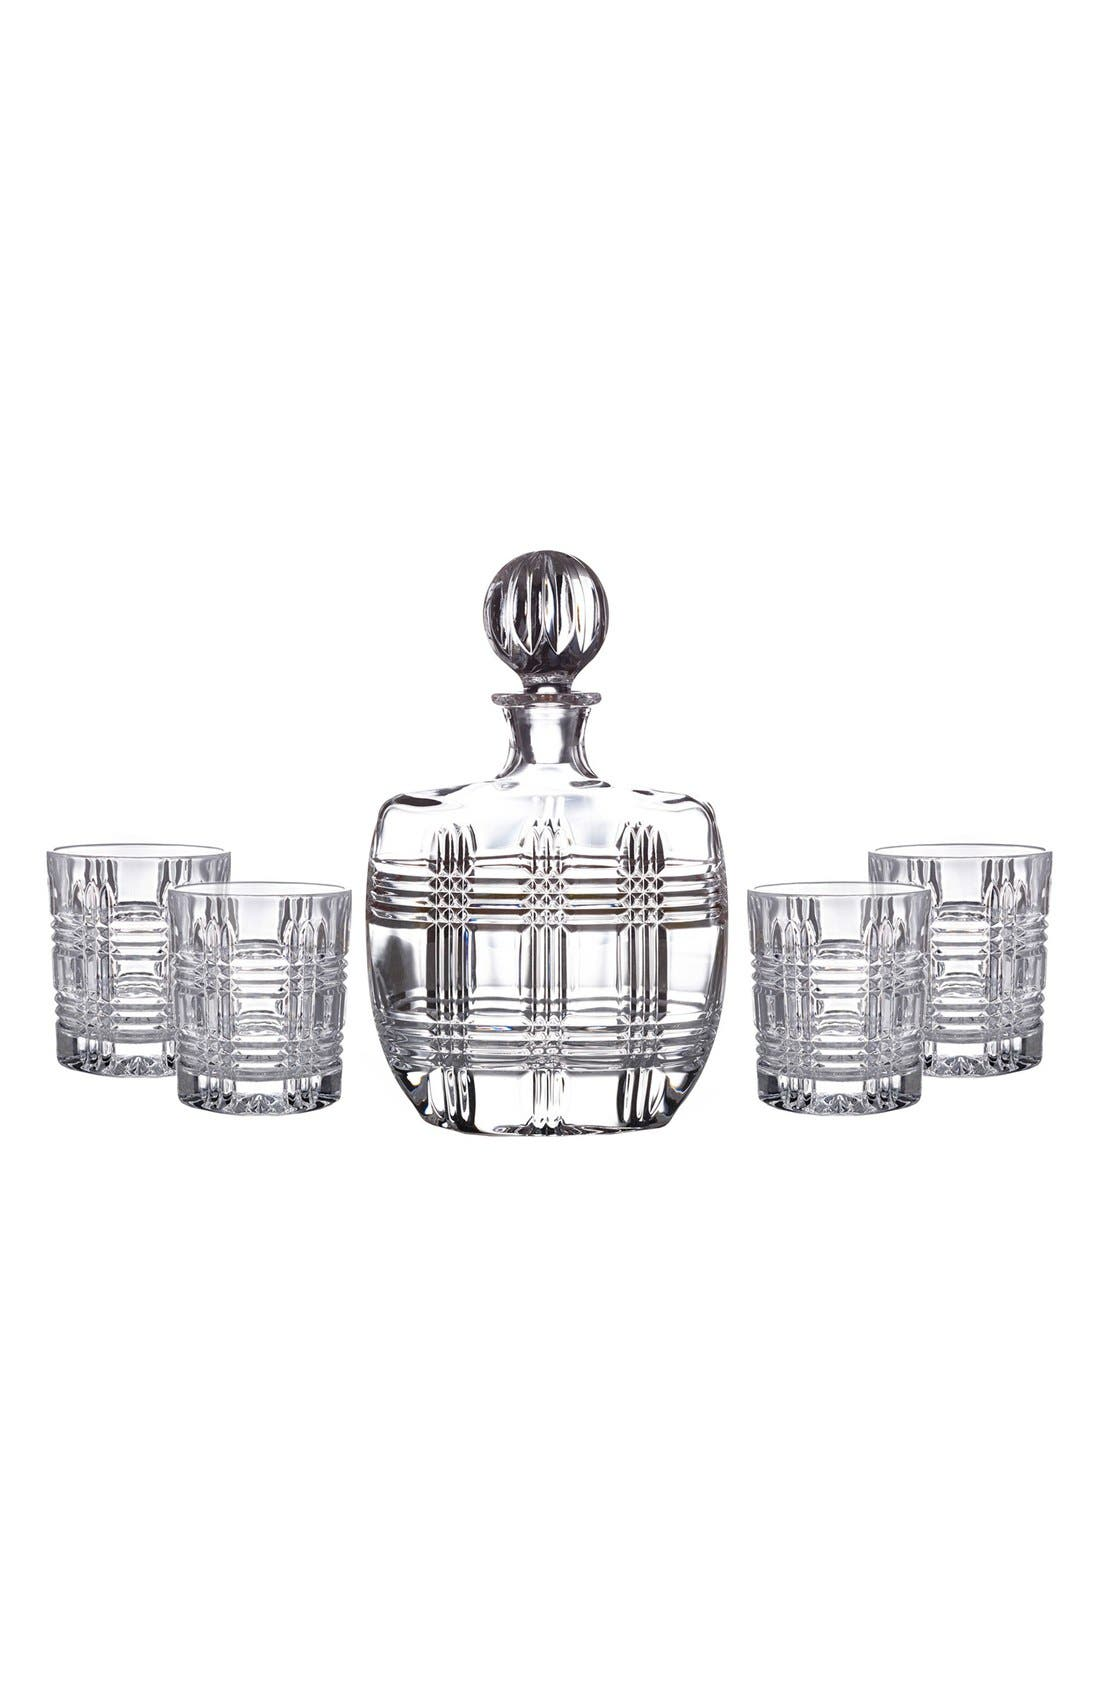 American Atelier Bridgeport 5-Piece Decanter & Whiskey Glasses Set